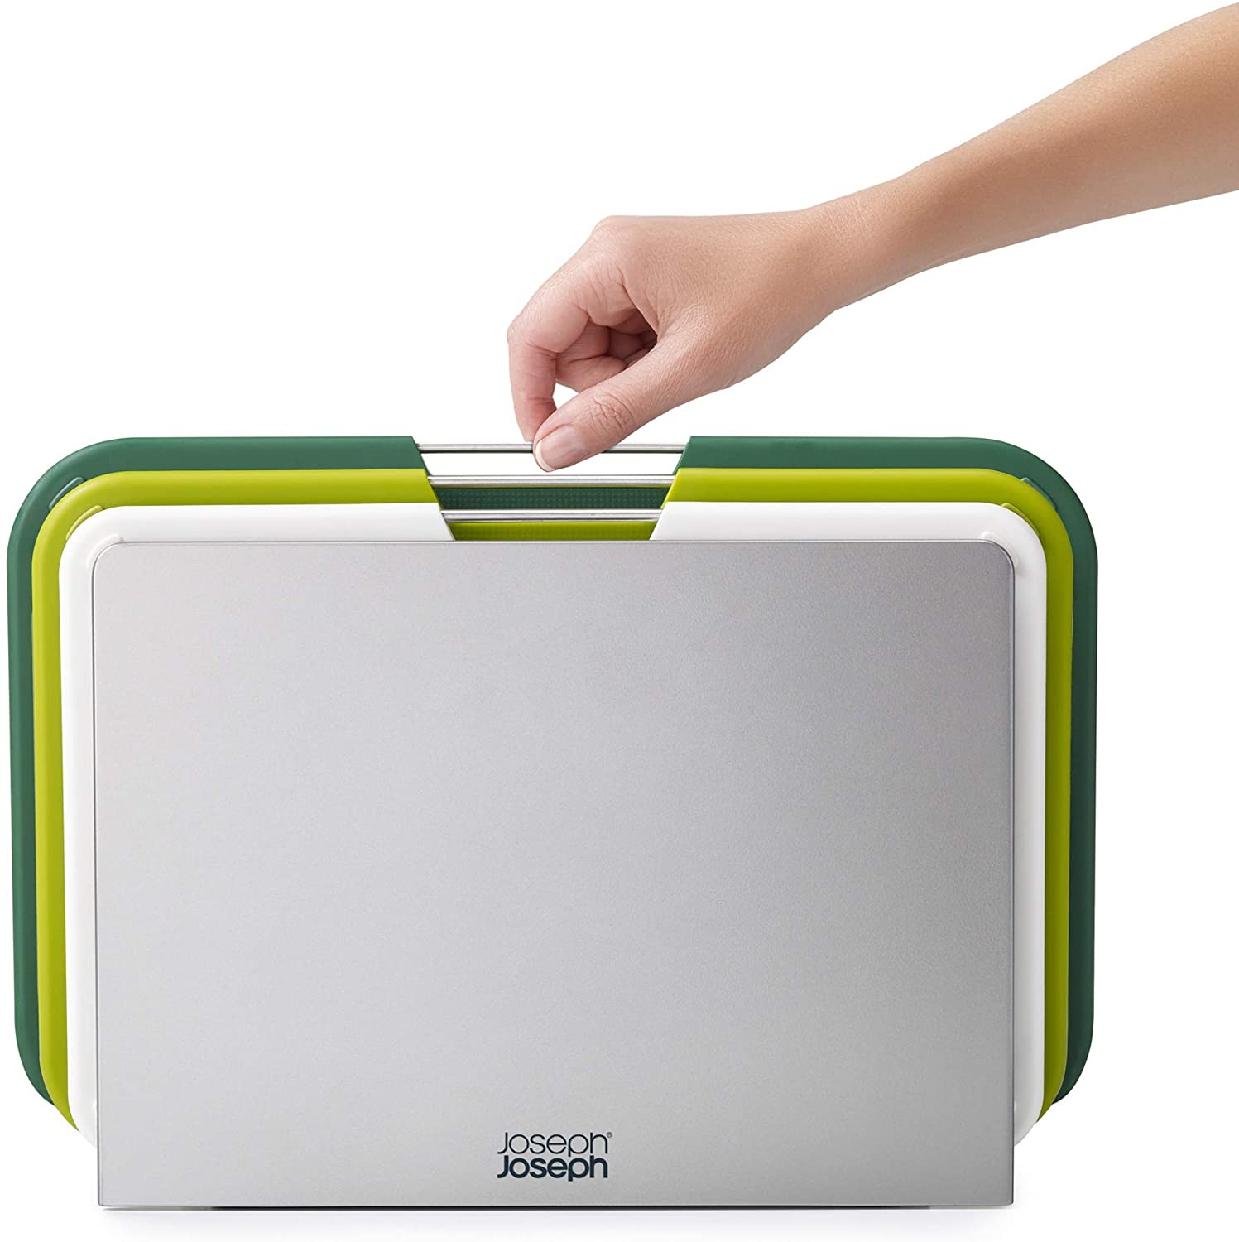 Joseph Joseph(ジョセフジョセフ) ネストボード まな板セット グリーンの商品画像2